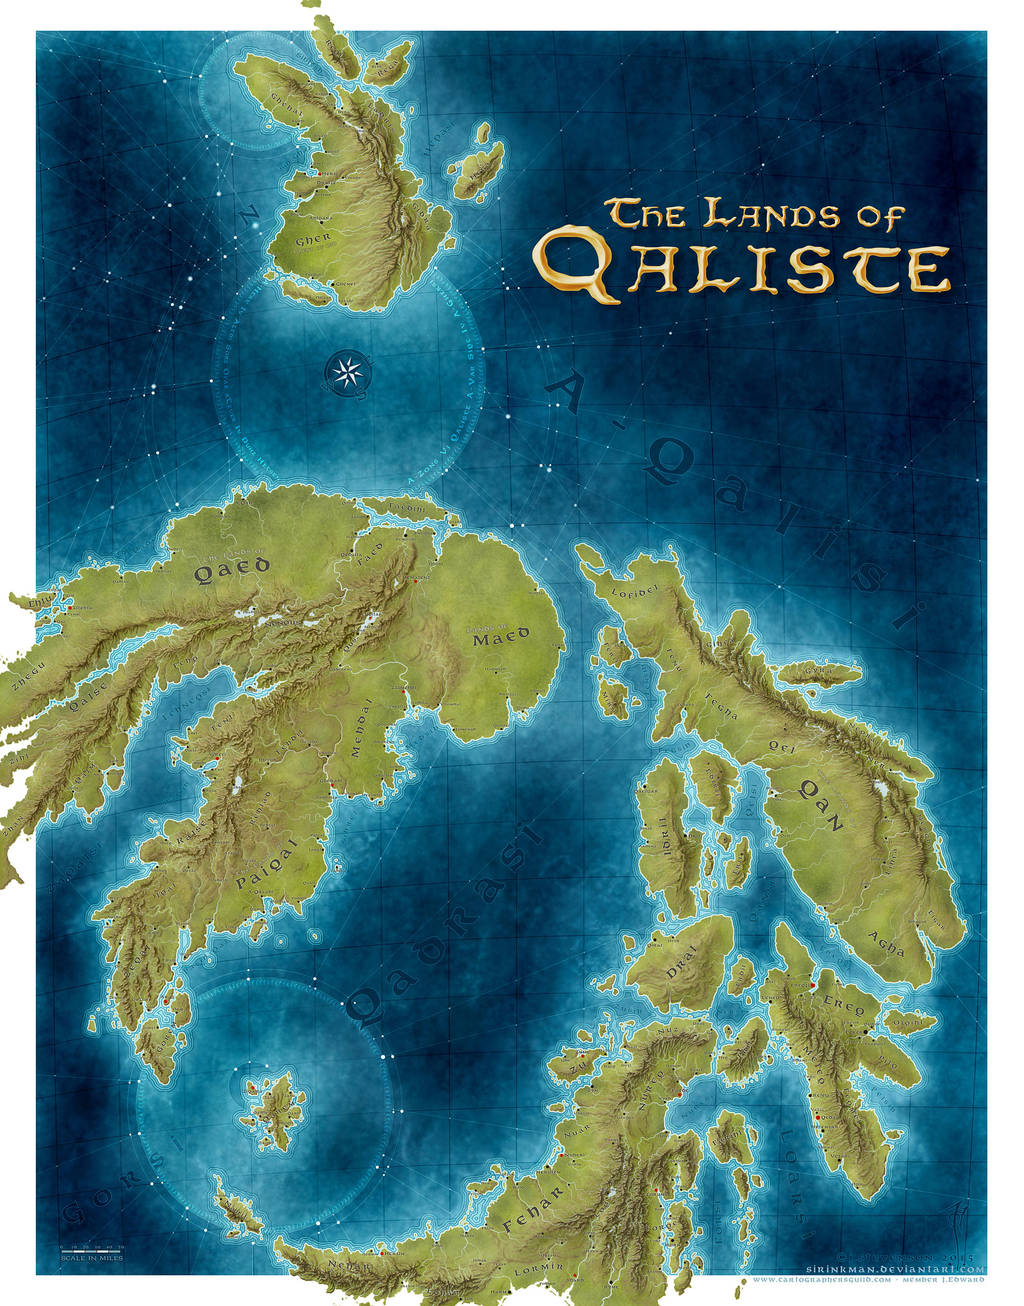 Lands of Qaliste [stage1] by sirinkman by SirInkman